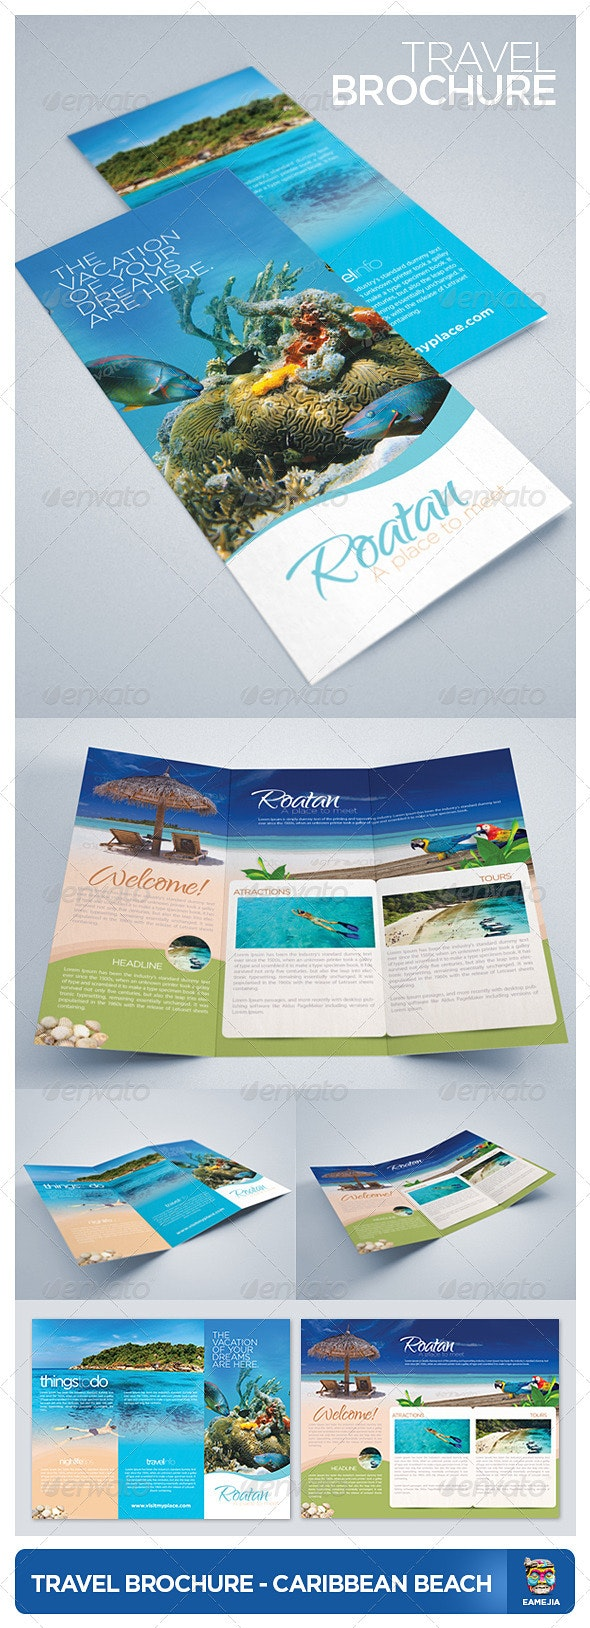 Travel and Tourism Brochure - Caribbean Beach - Brochures Print Templates